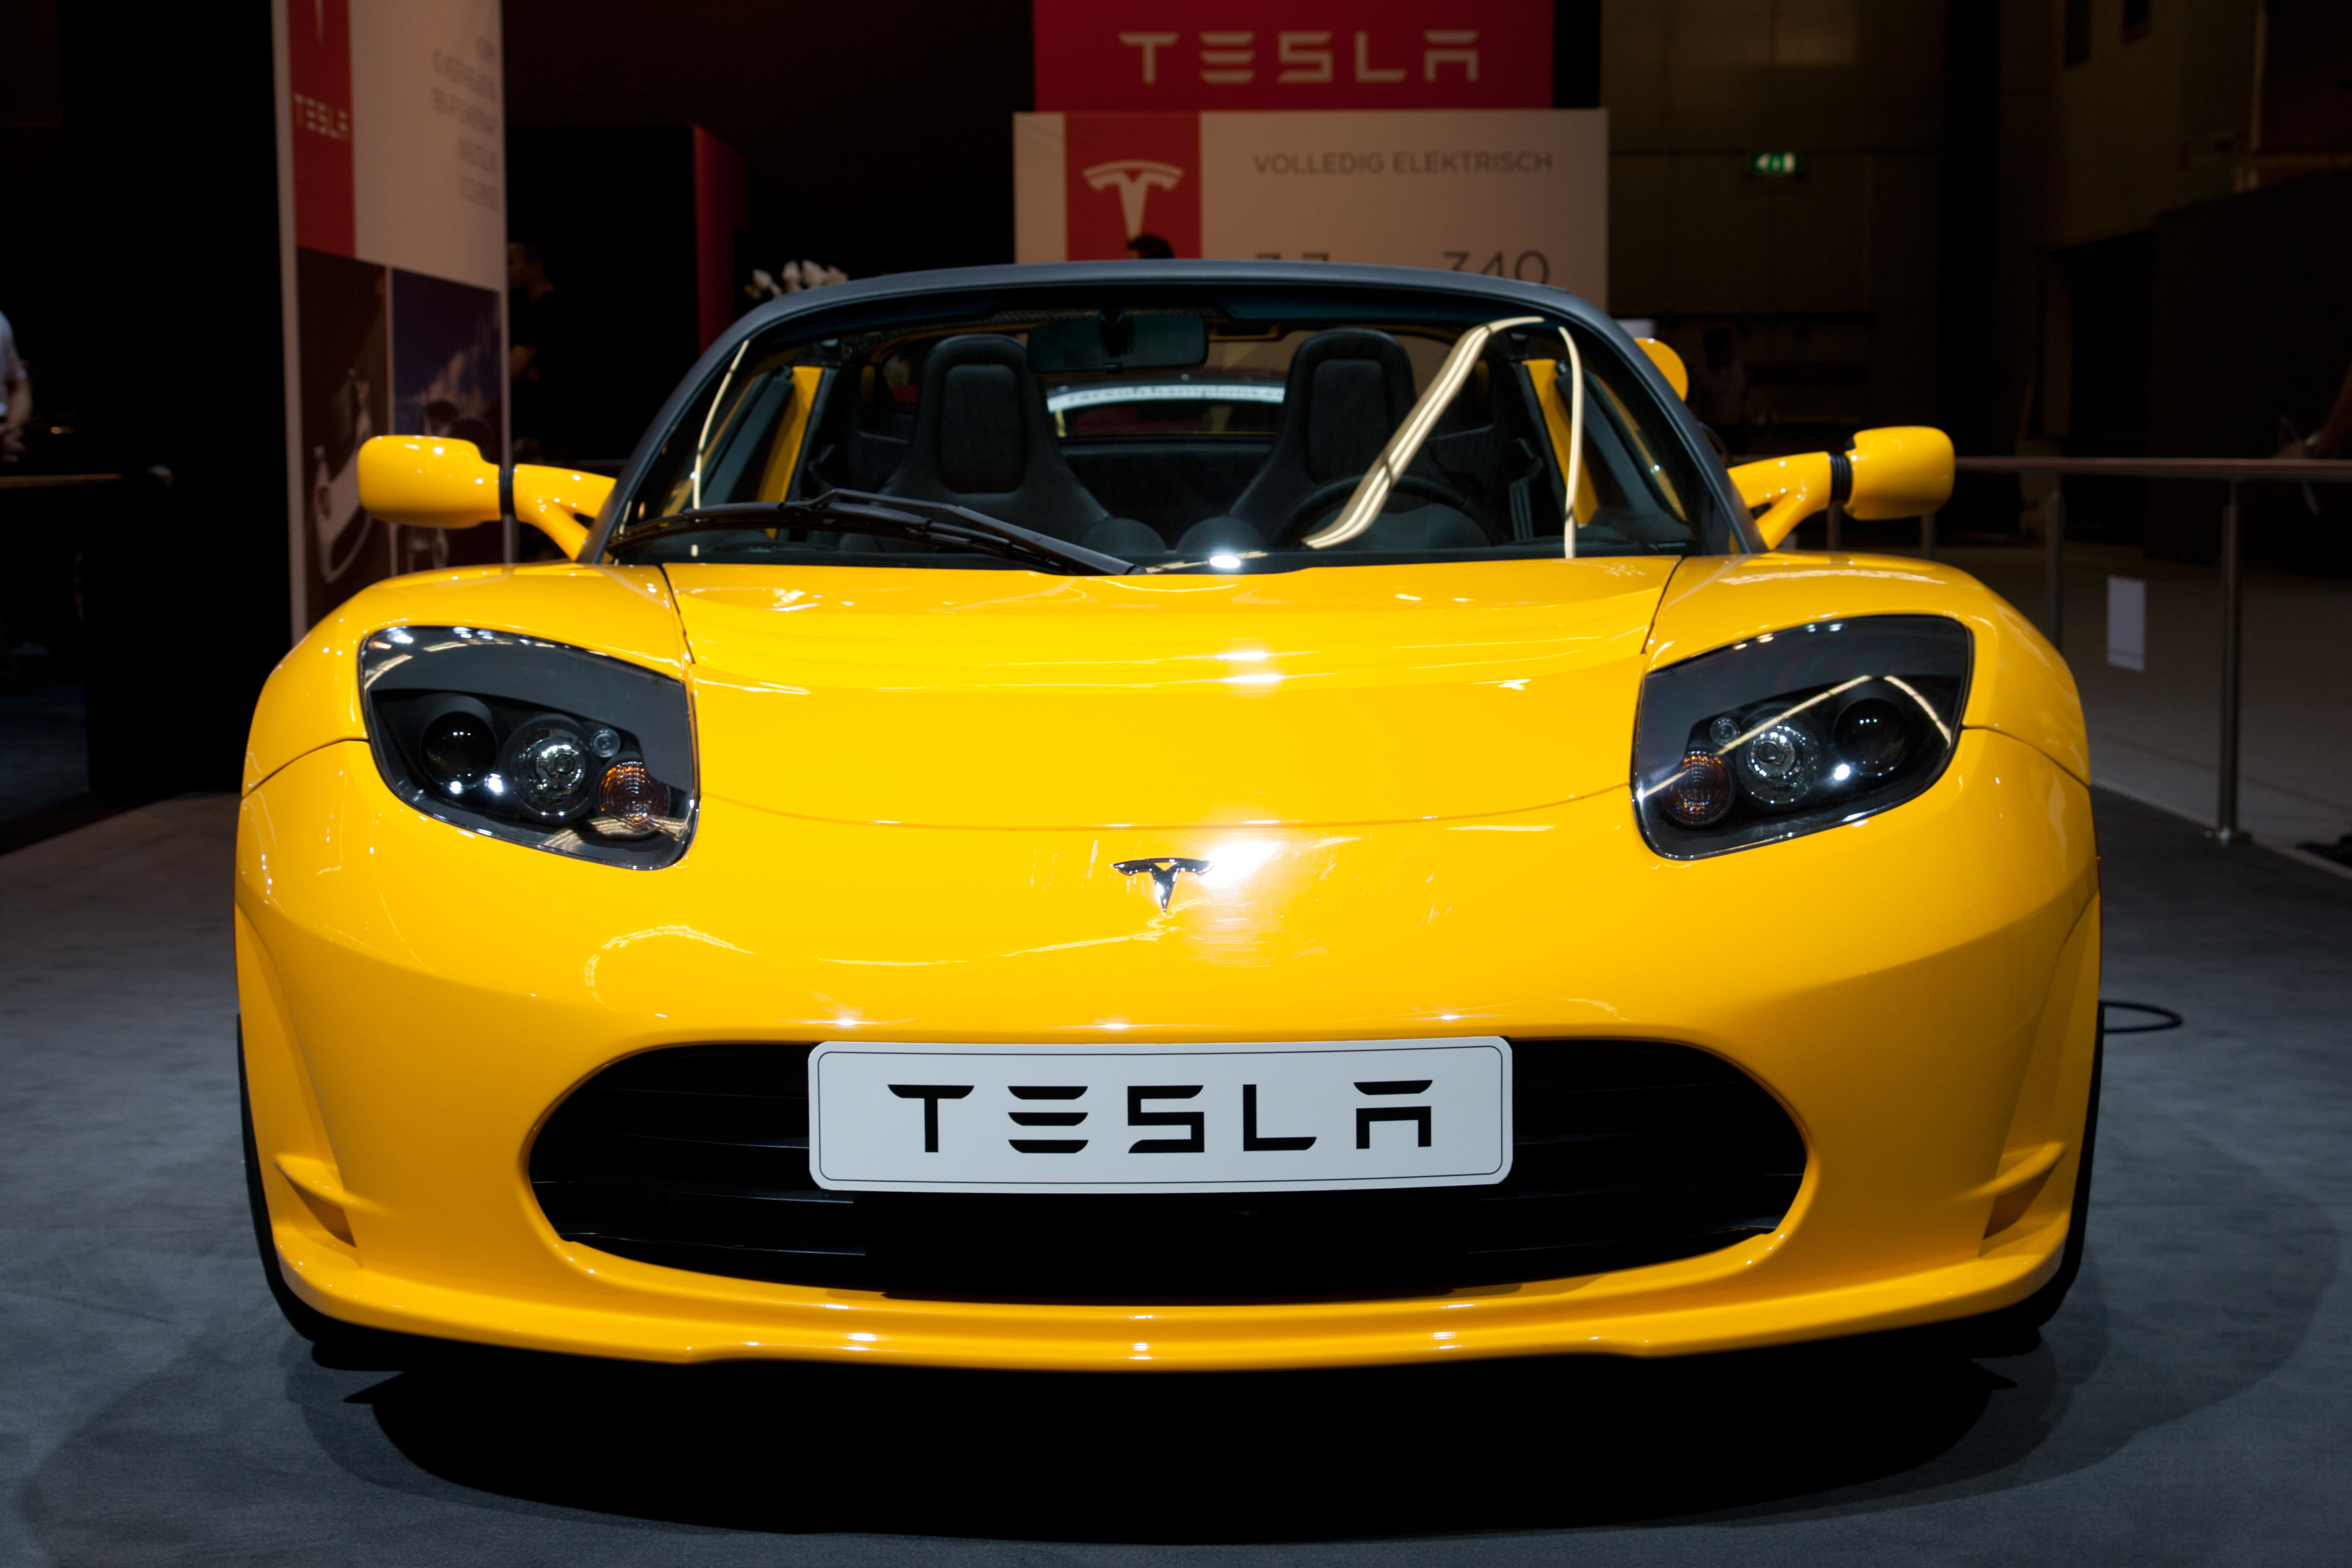 The original Tesla Roadster